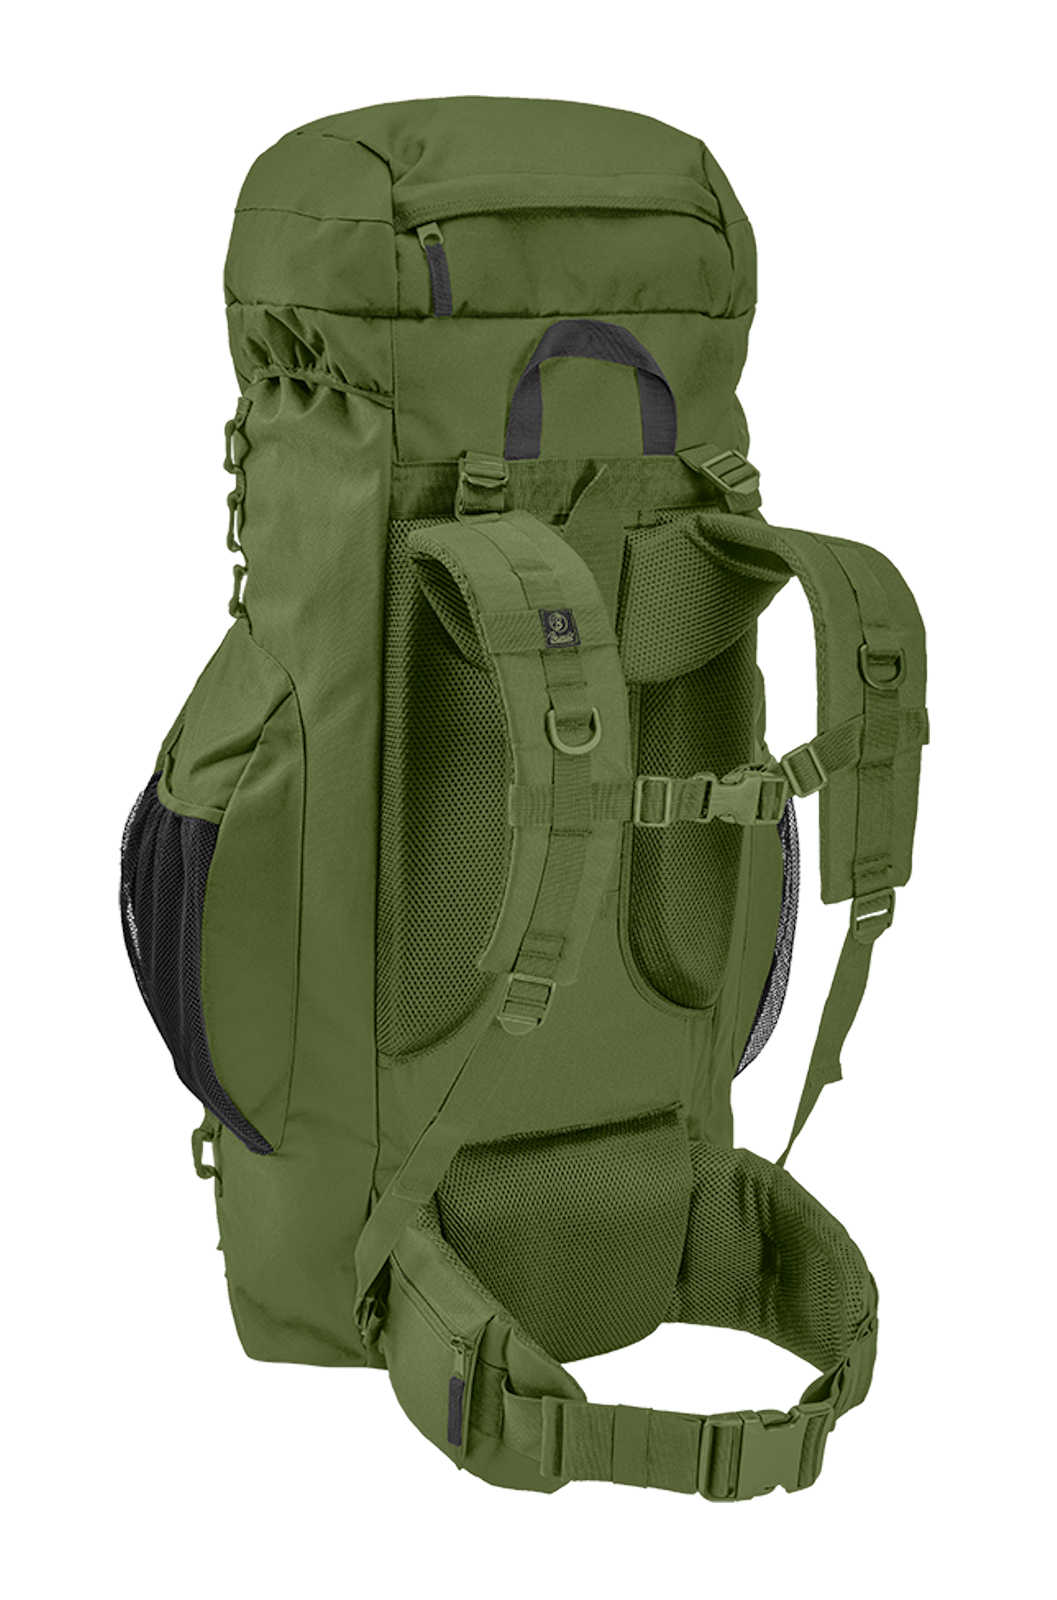 Rucksack AVIATOR 65 Liter OLIV Trekking Outdoor Wandern Regenhülle Air System